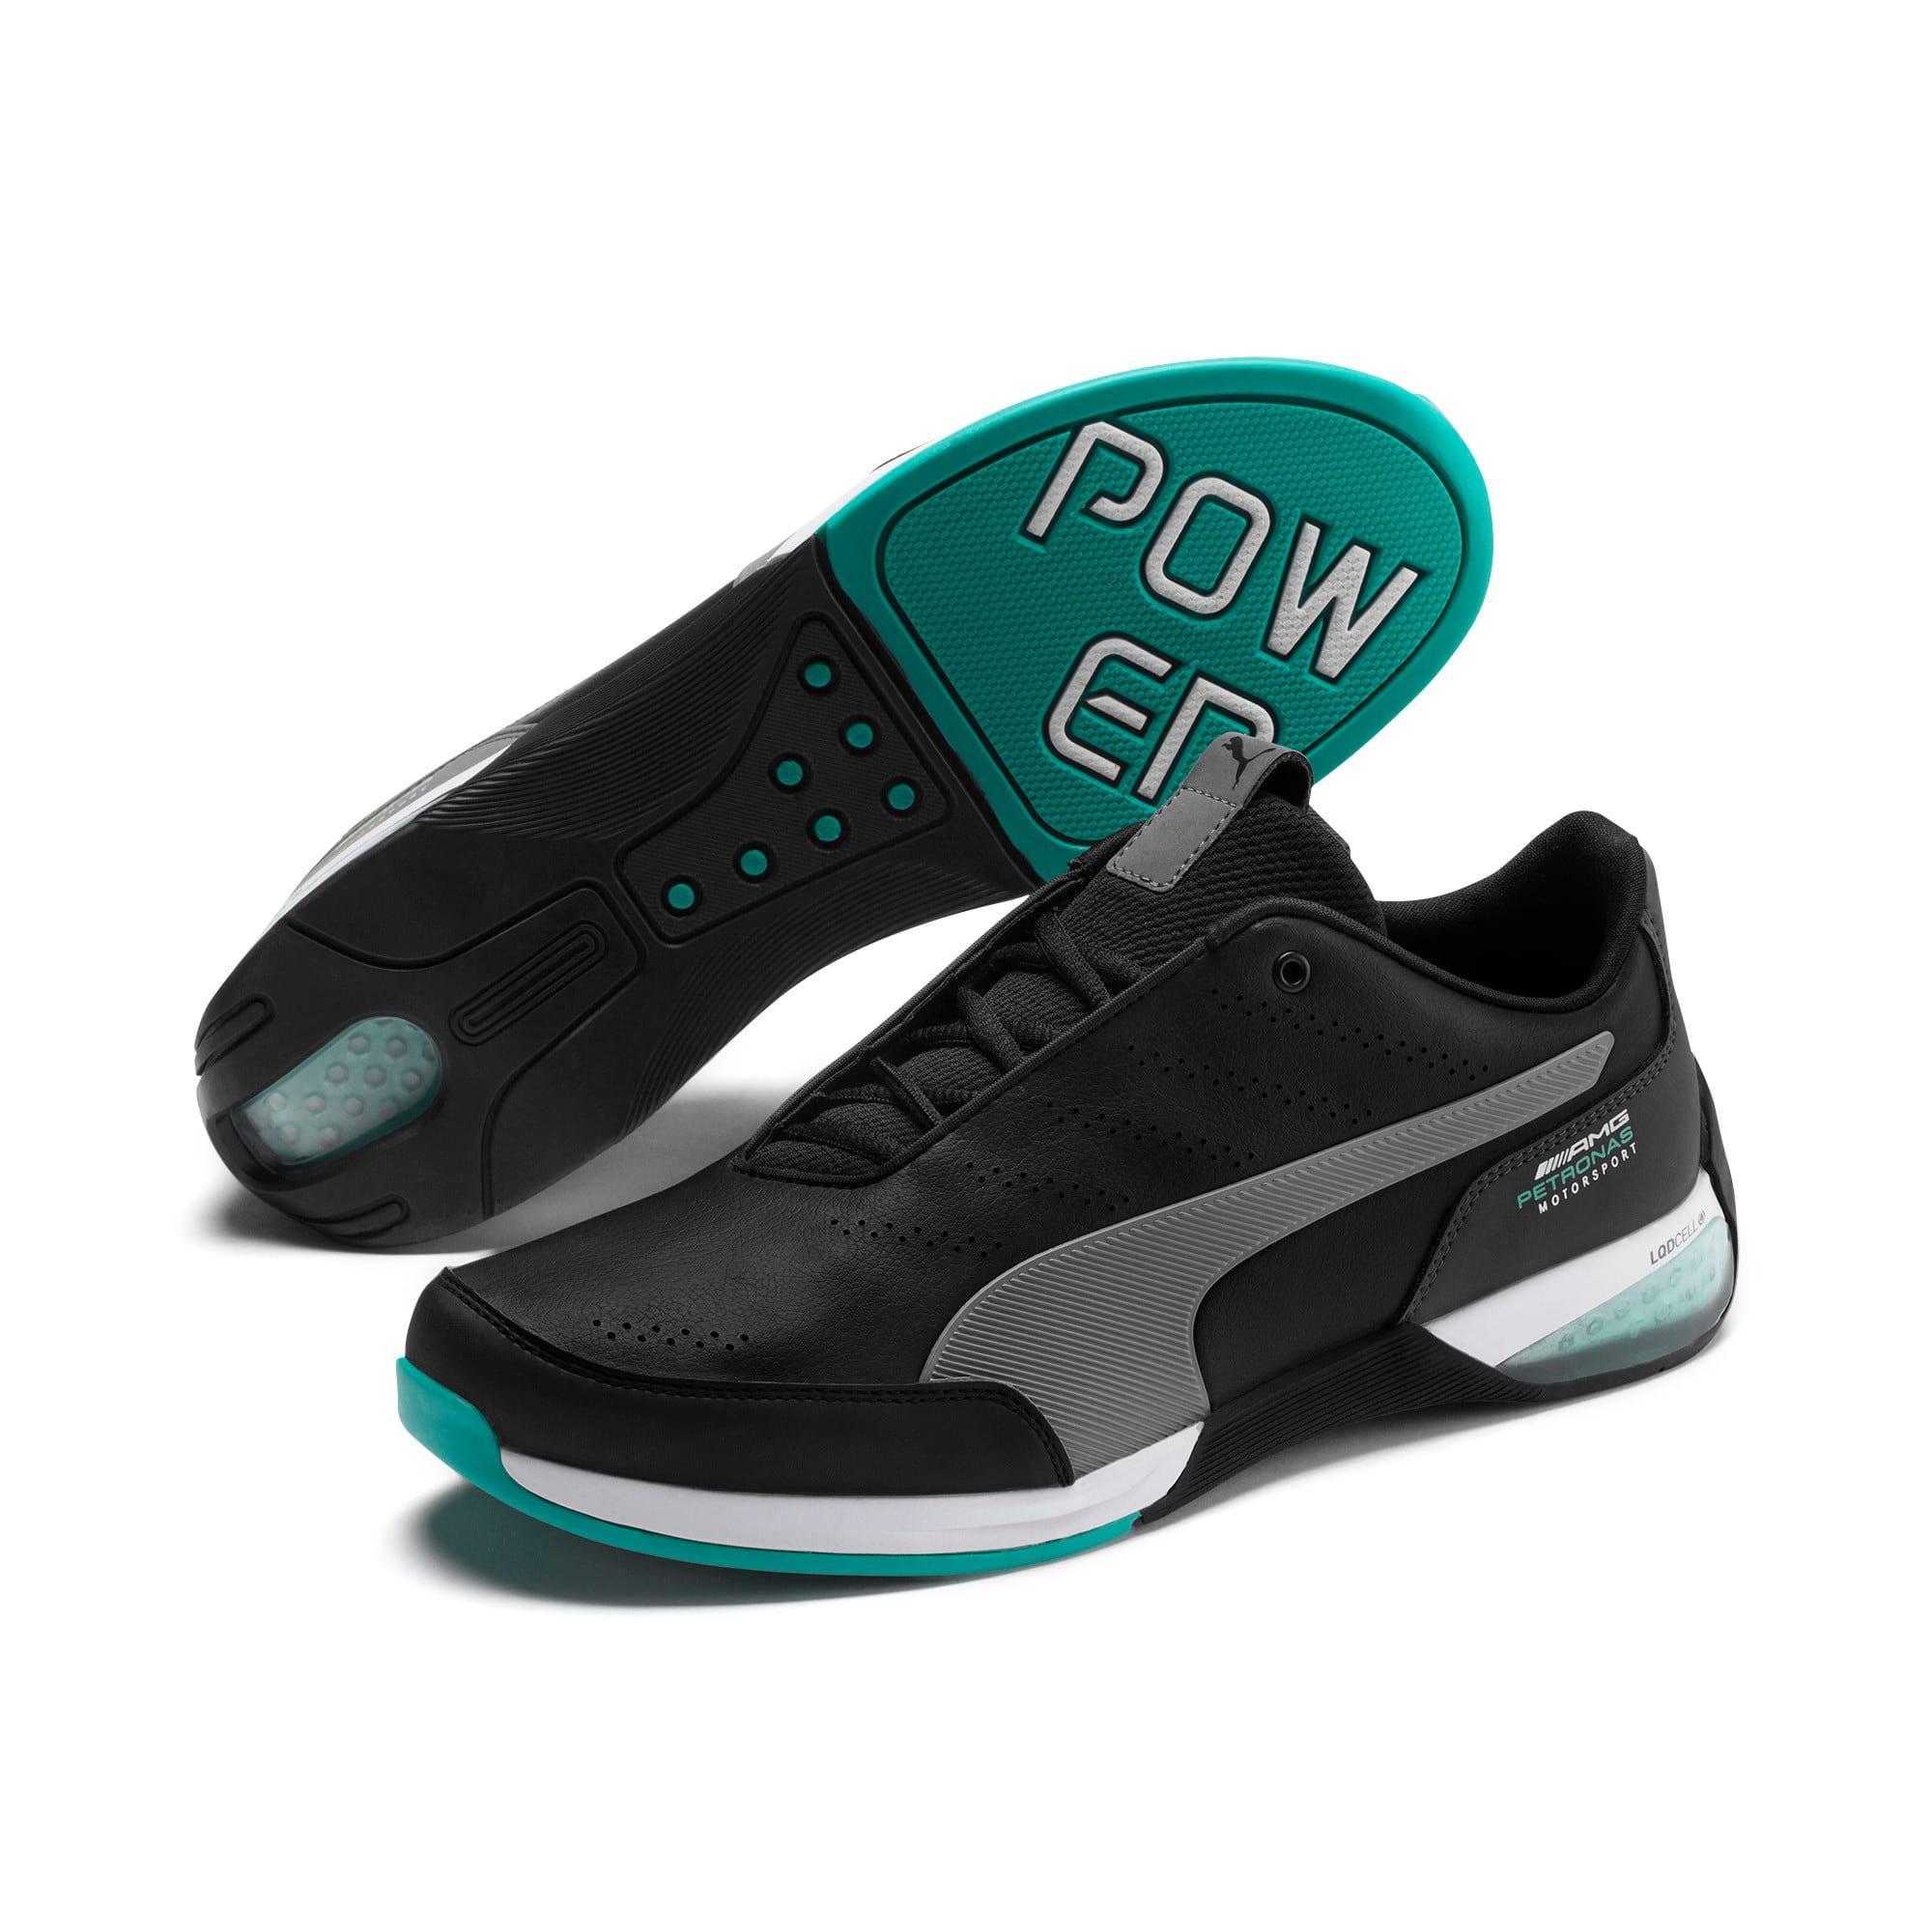 Thumbnail 3 of Mercedes AMG Petronas Kart Cat X Men's Training Shoes, Puma Black-Smoked Pearl, medium